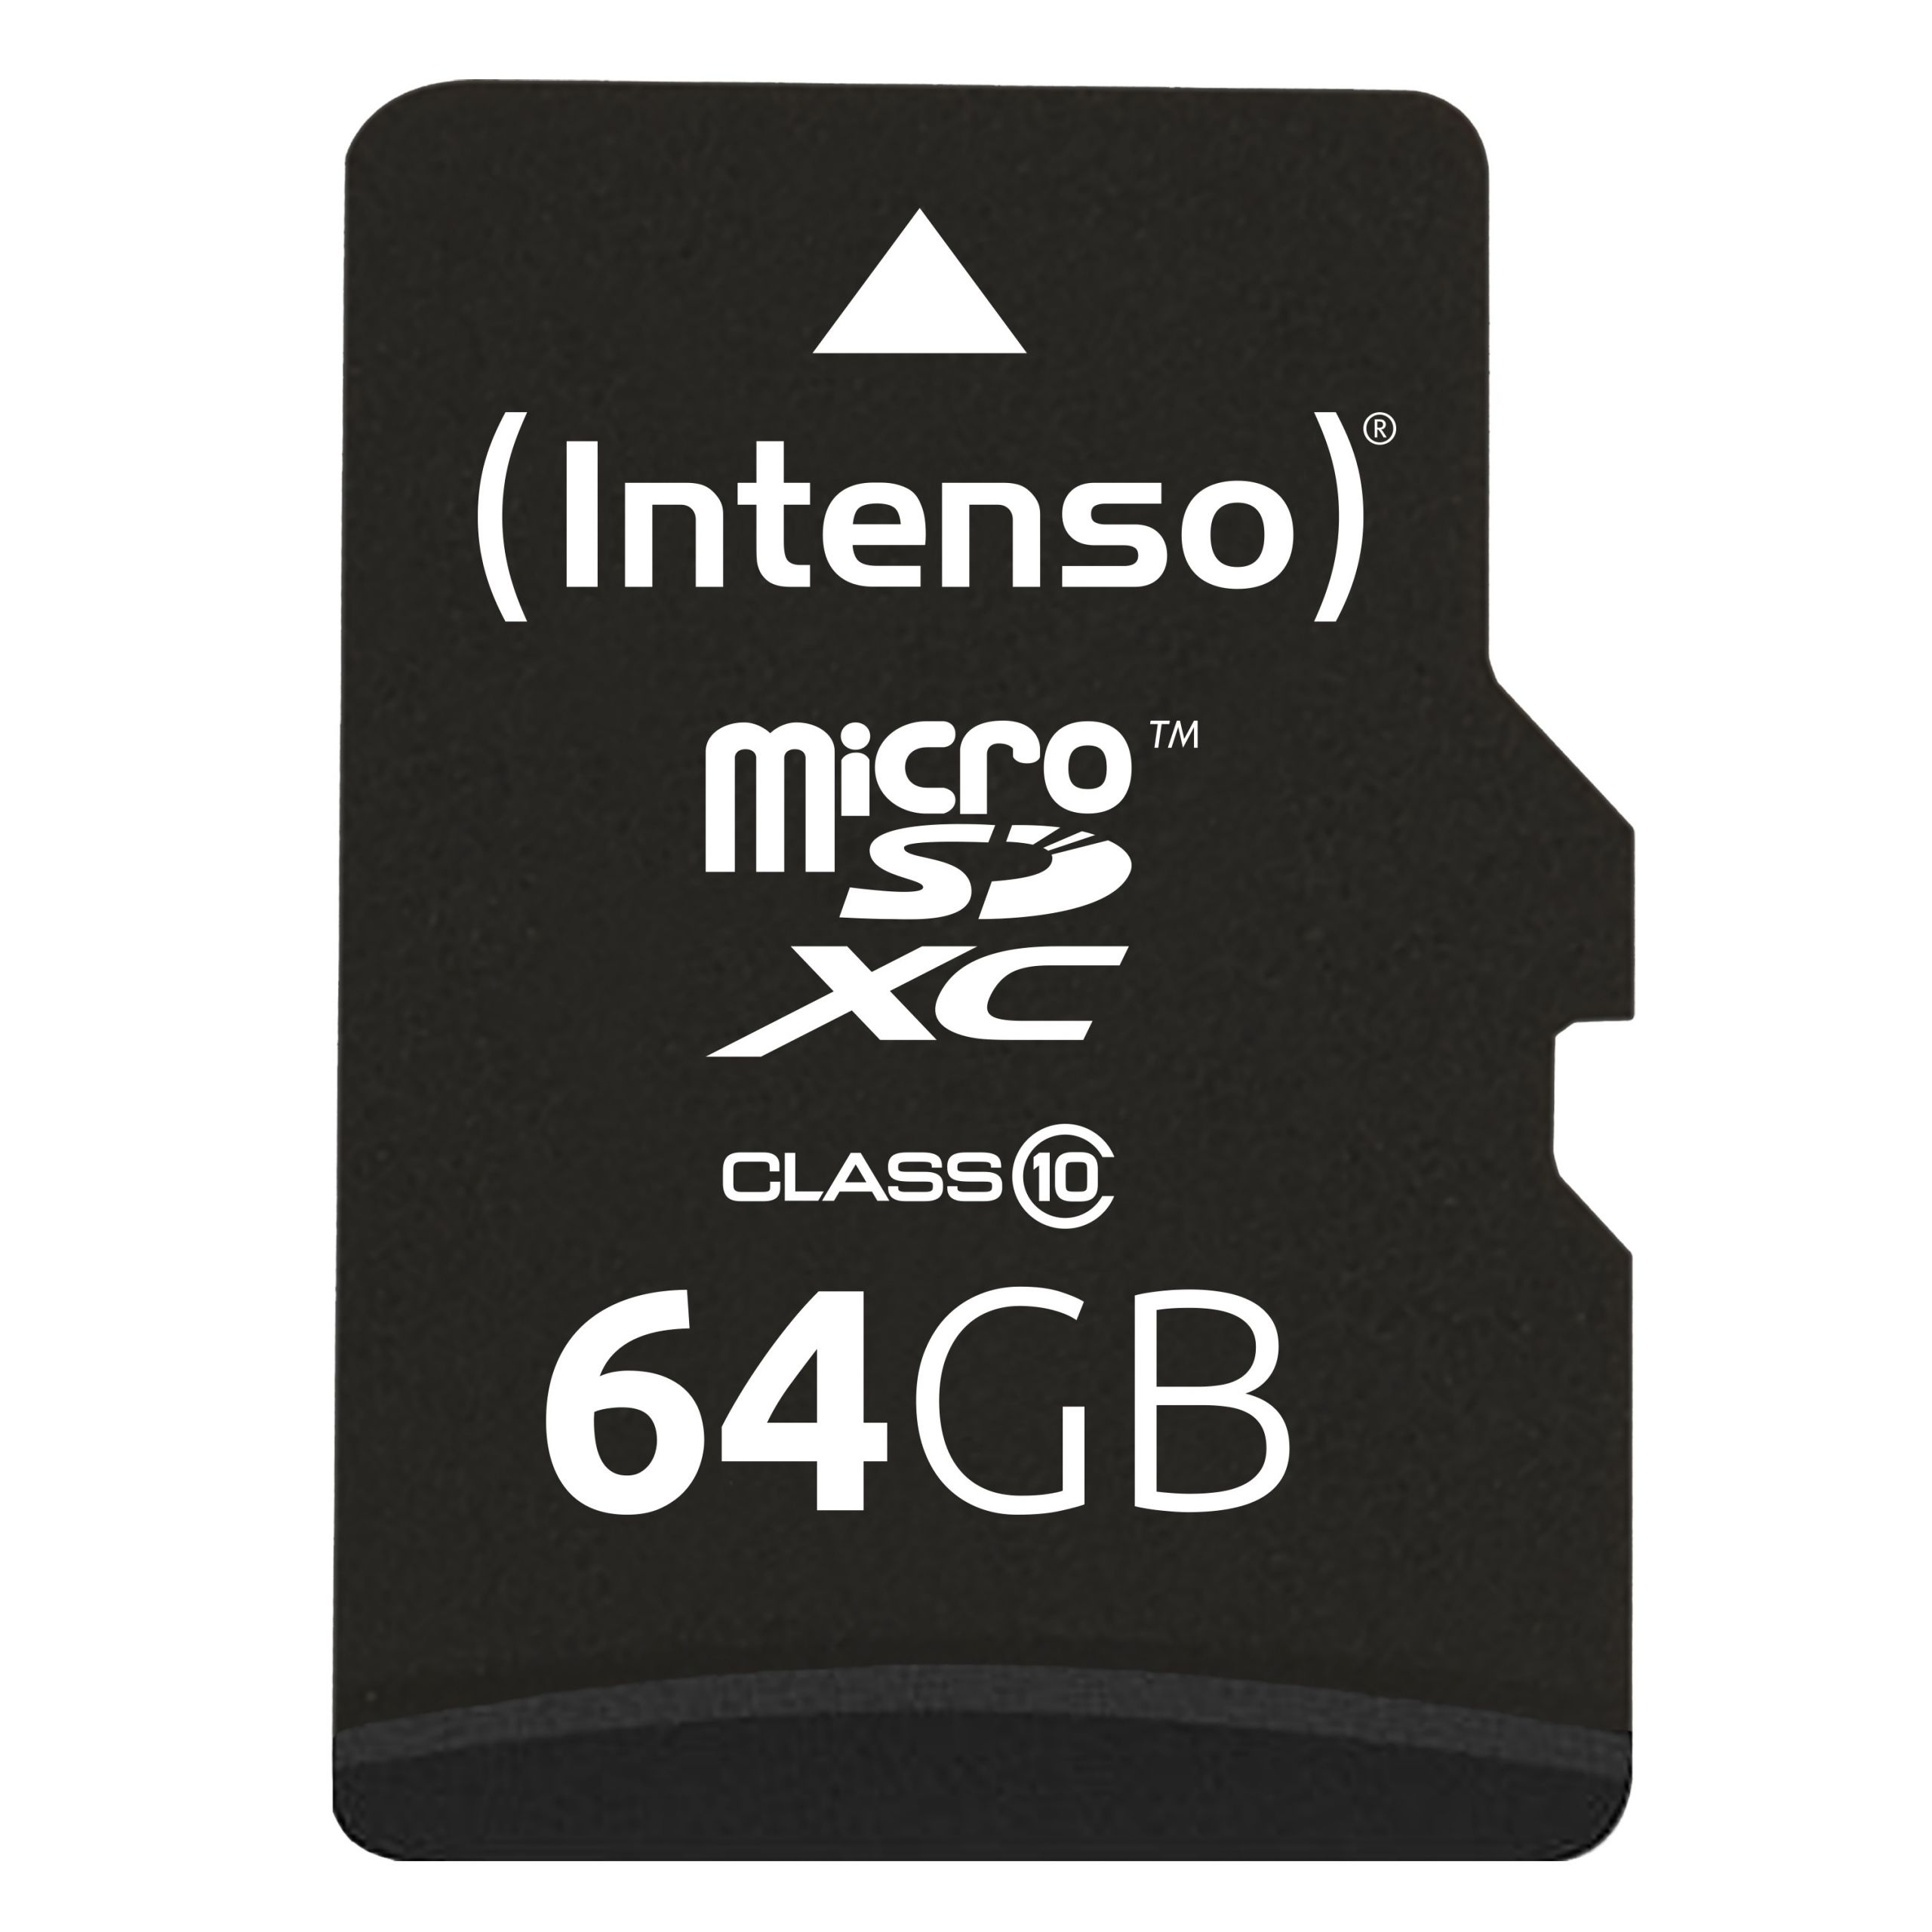 intenso 64gb microsdhc 4034303017973 2 jpg